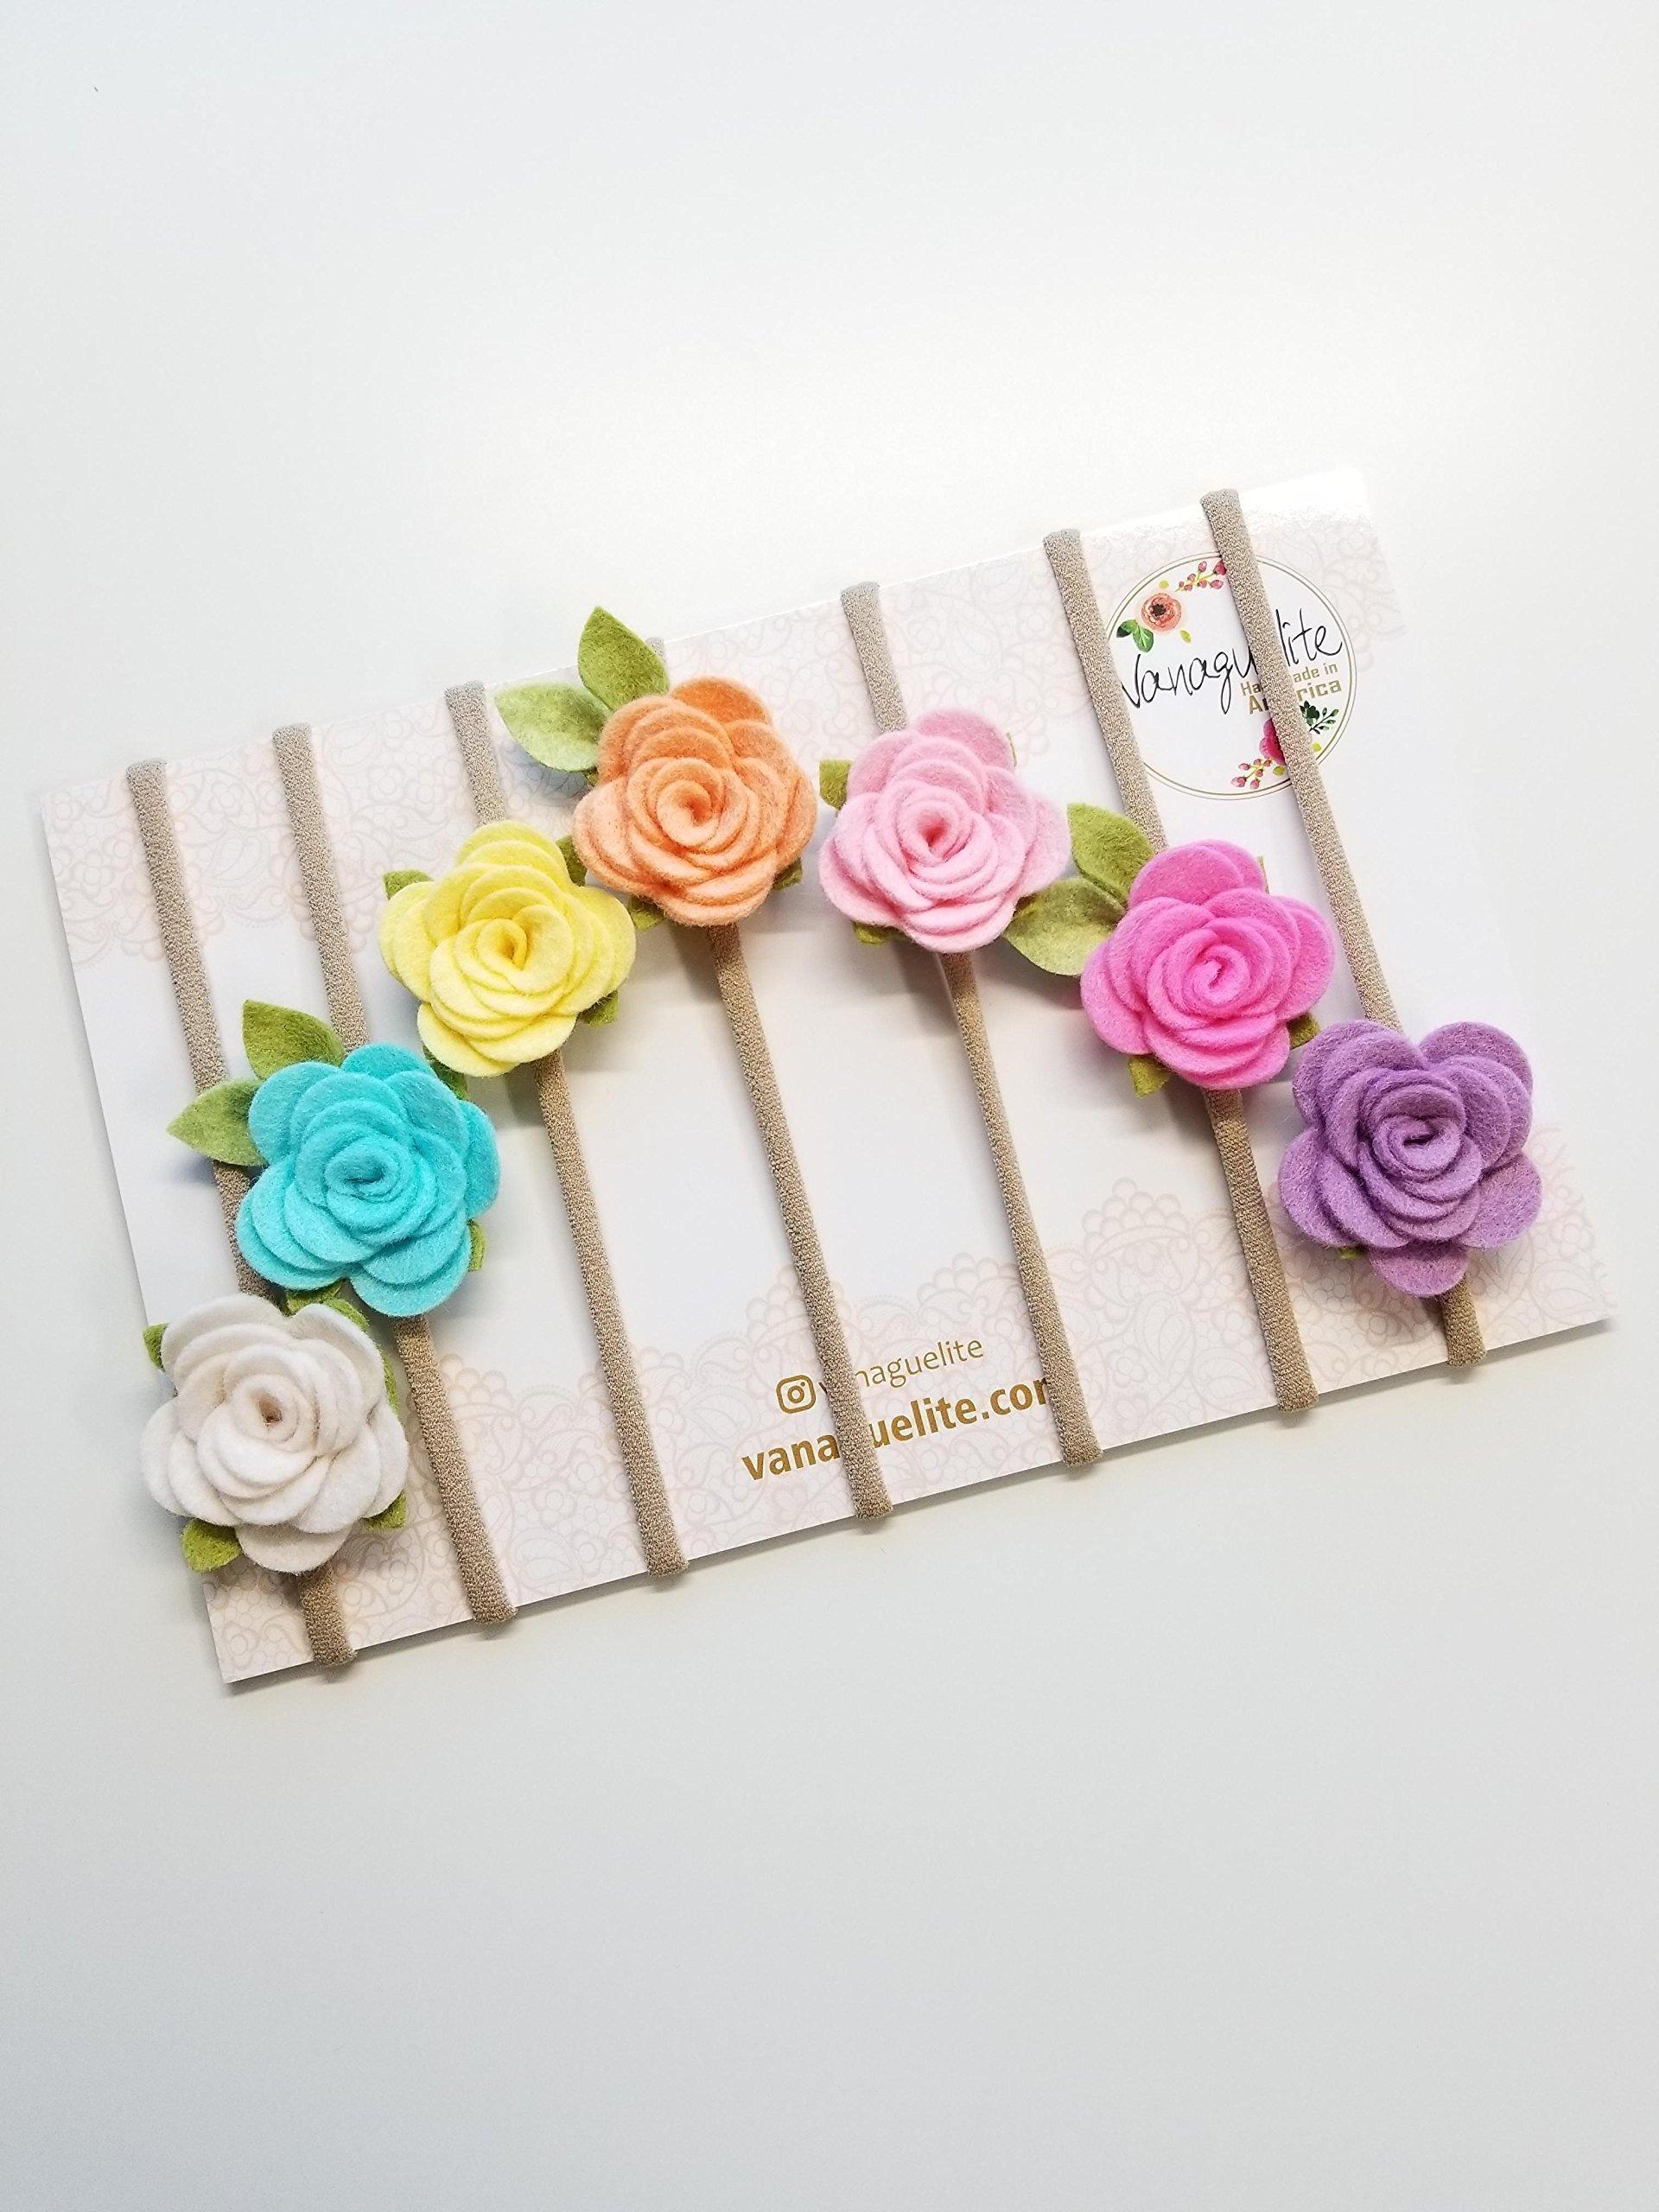 Baby Bows Flower RAINBOW Nylon Headbands felt flower handmade in America Set of 7 by Vanaguelite